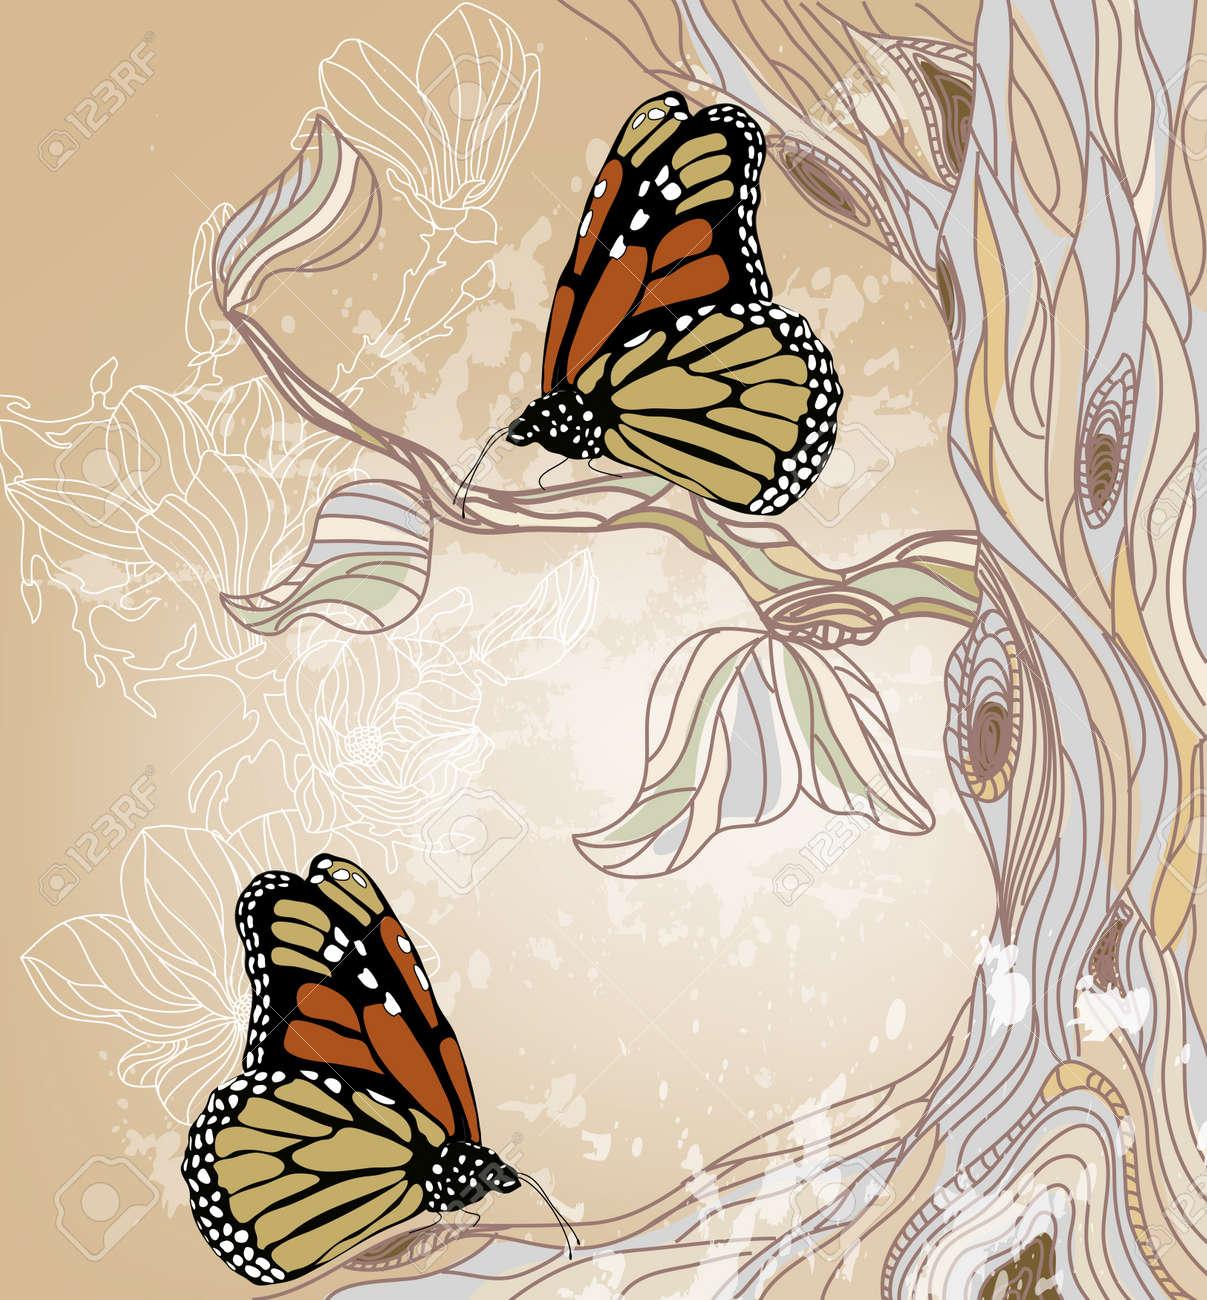 Image result for spring artistic image